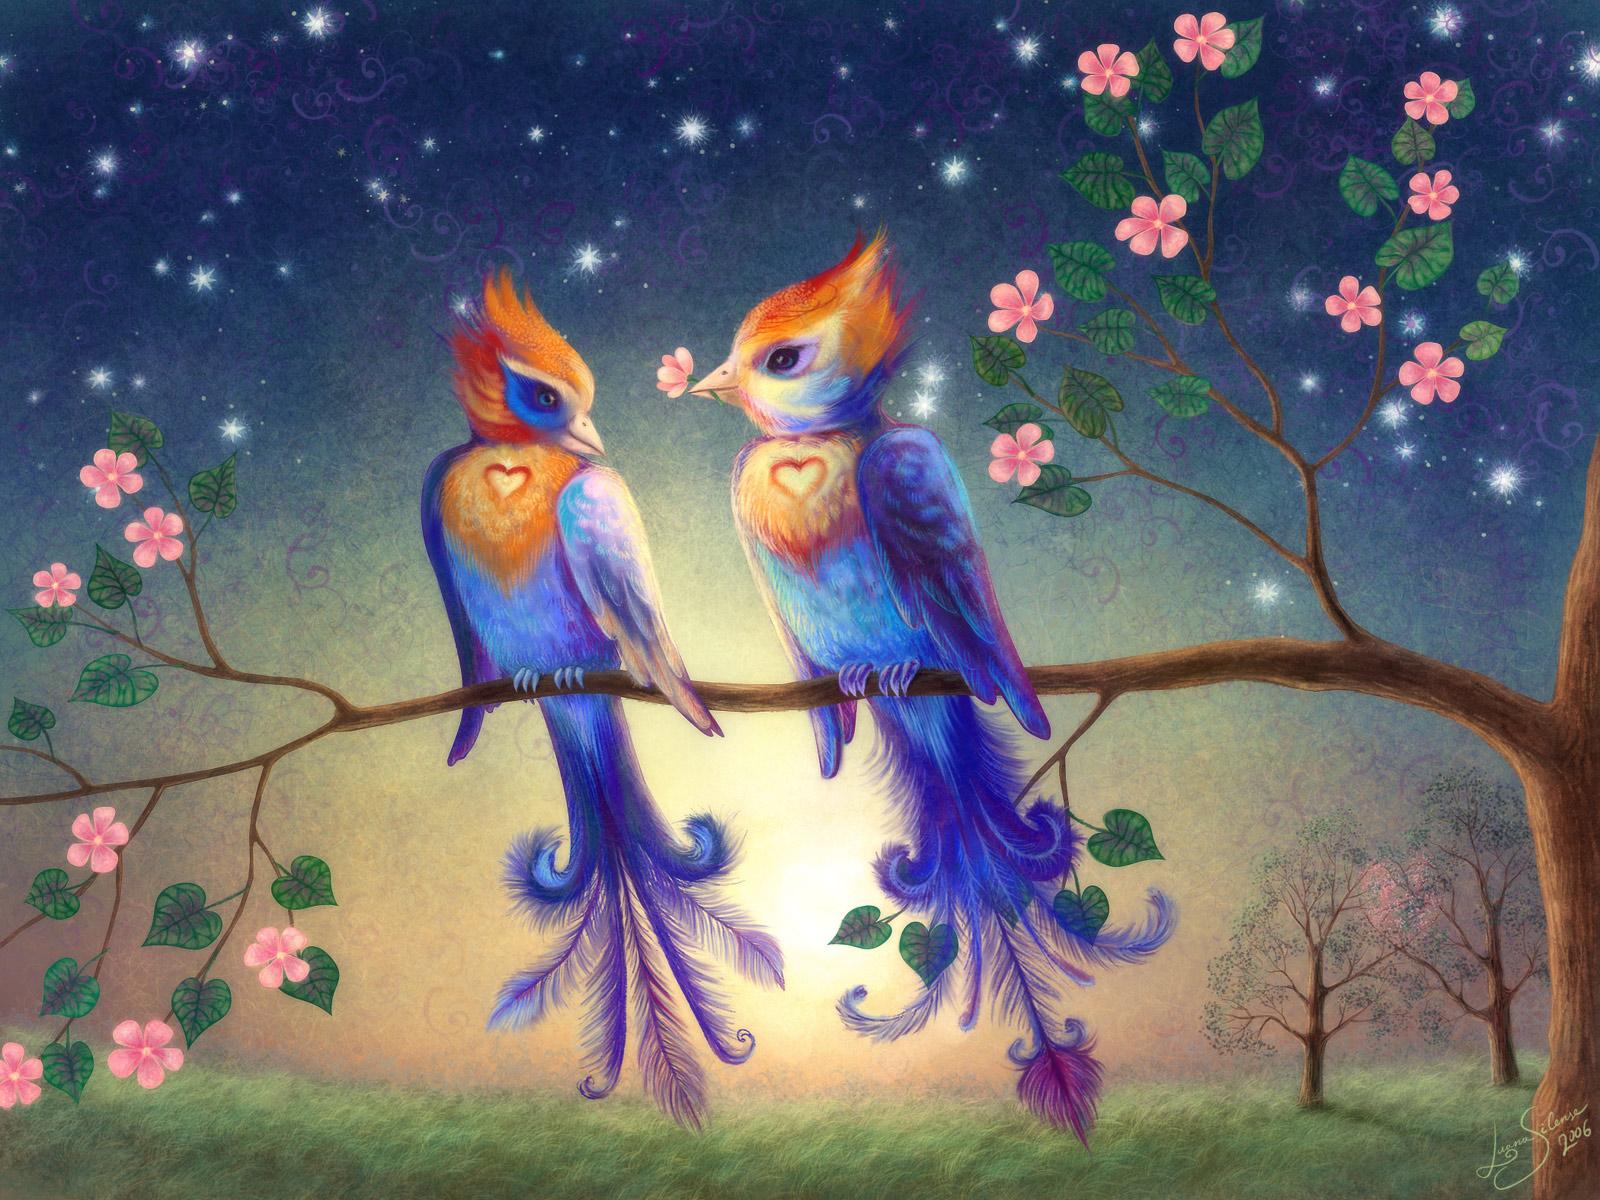 PicturesPool: Love Birds Wallpapers  Beautiful Birds Pictures